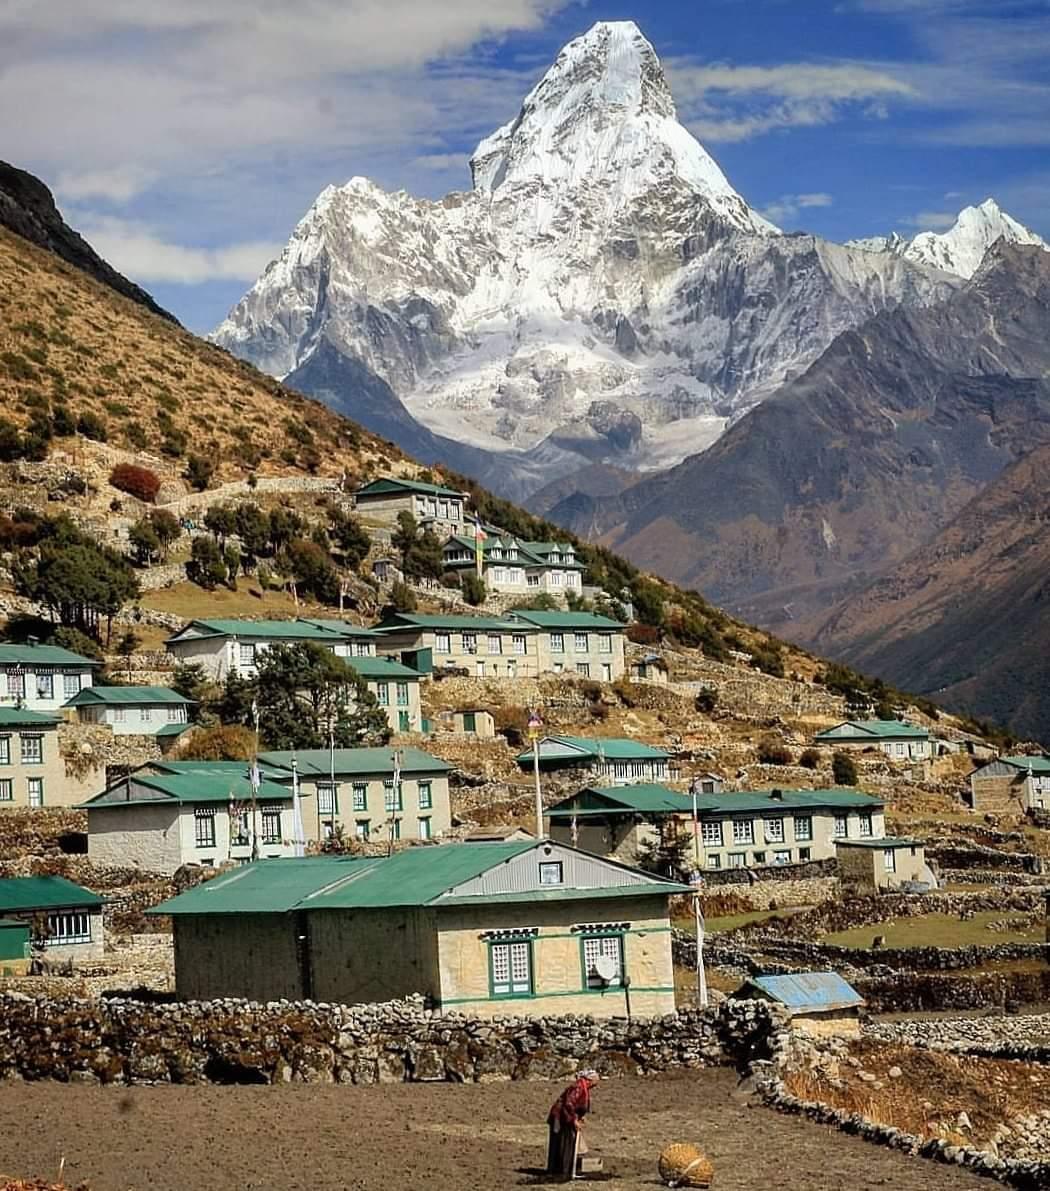 Khumjung Village, on the Everest region of Nepal. Behind Amadablam mountain. Book your next adventure with local tour operator.  photo: Sundar Thapa #trekking #trekkinginnepal #trektour #travelnepal #everestregiontrek #amadablam #khumjungvillage #everesttrek #everestbasecamptrek